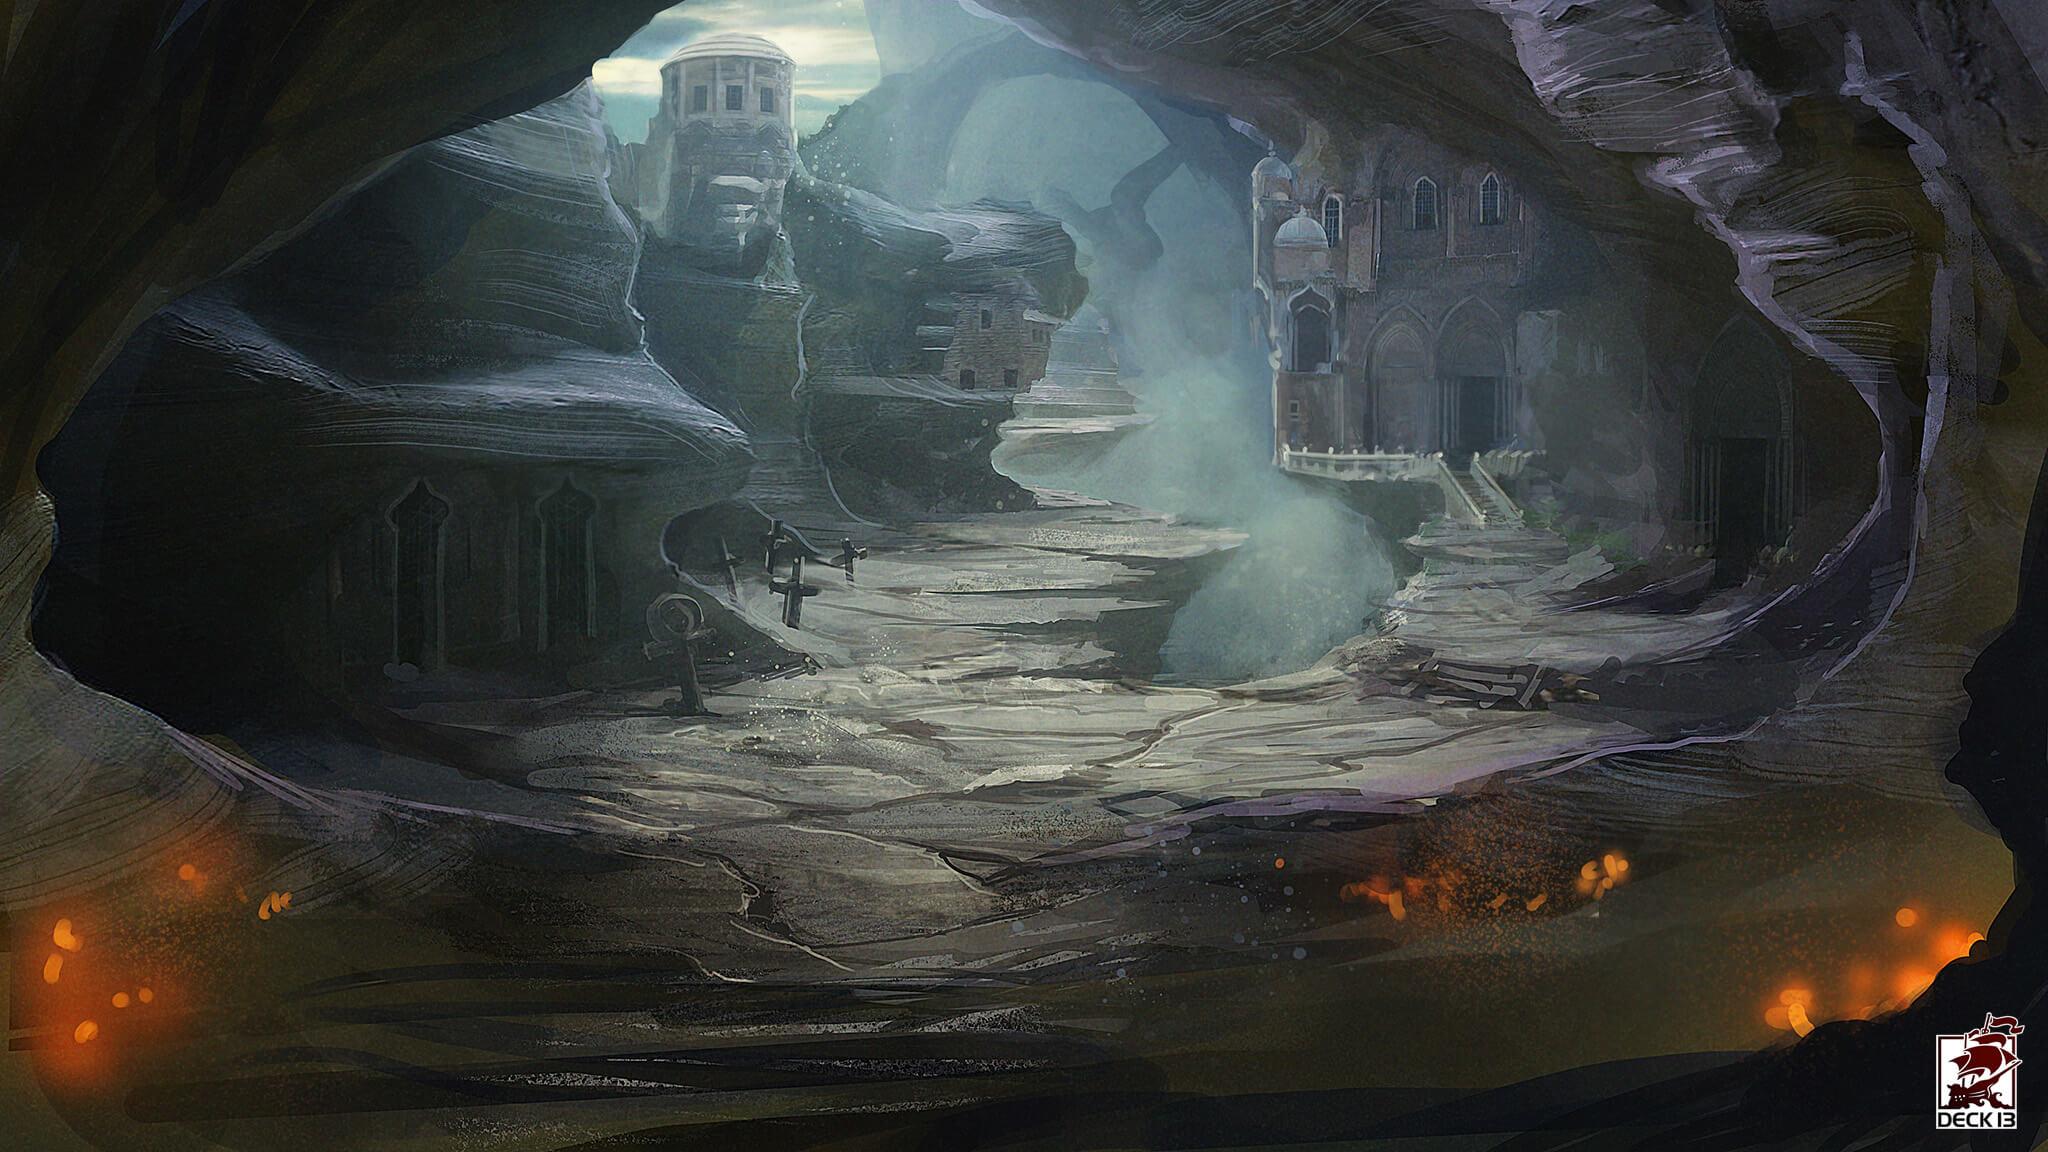 blood-knights-concept-art-felix-haas-holy-land-003